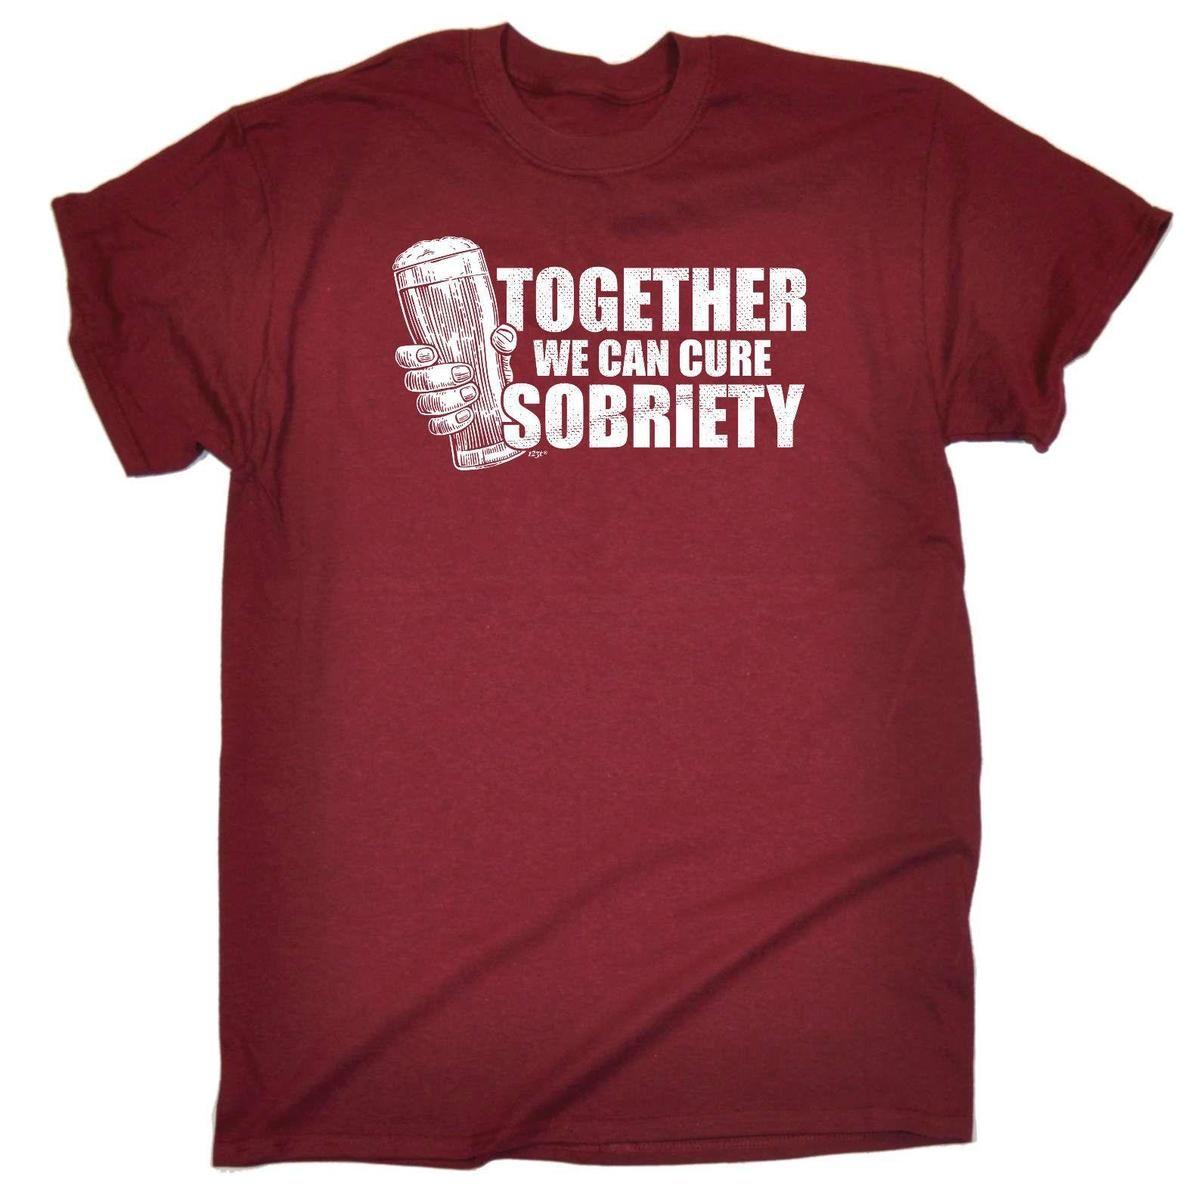 c6fc0745 Funny T Shirt Cure Sobriety Birthday Joke Humour Tee Gift Novelty T SHIRT  Tee Shirts Mens T Shirts From Lijian55, $12.08| DHgate.Com